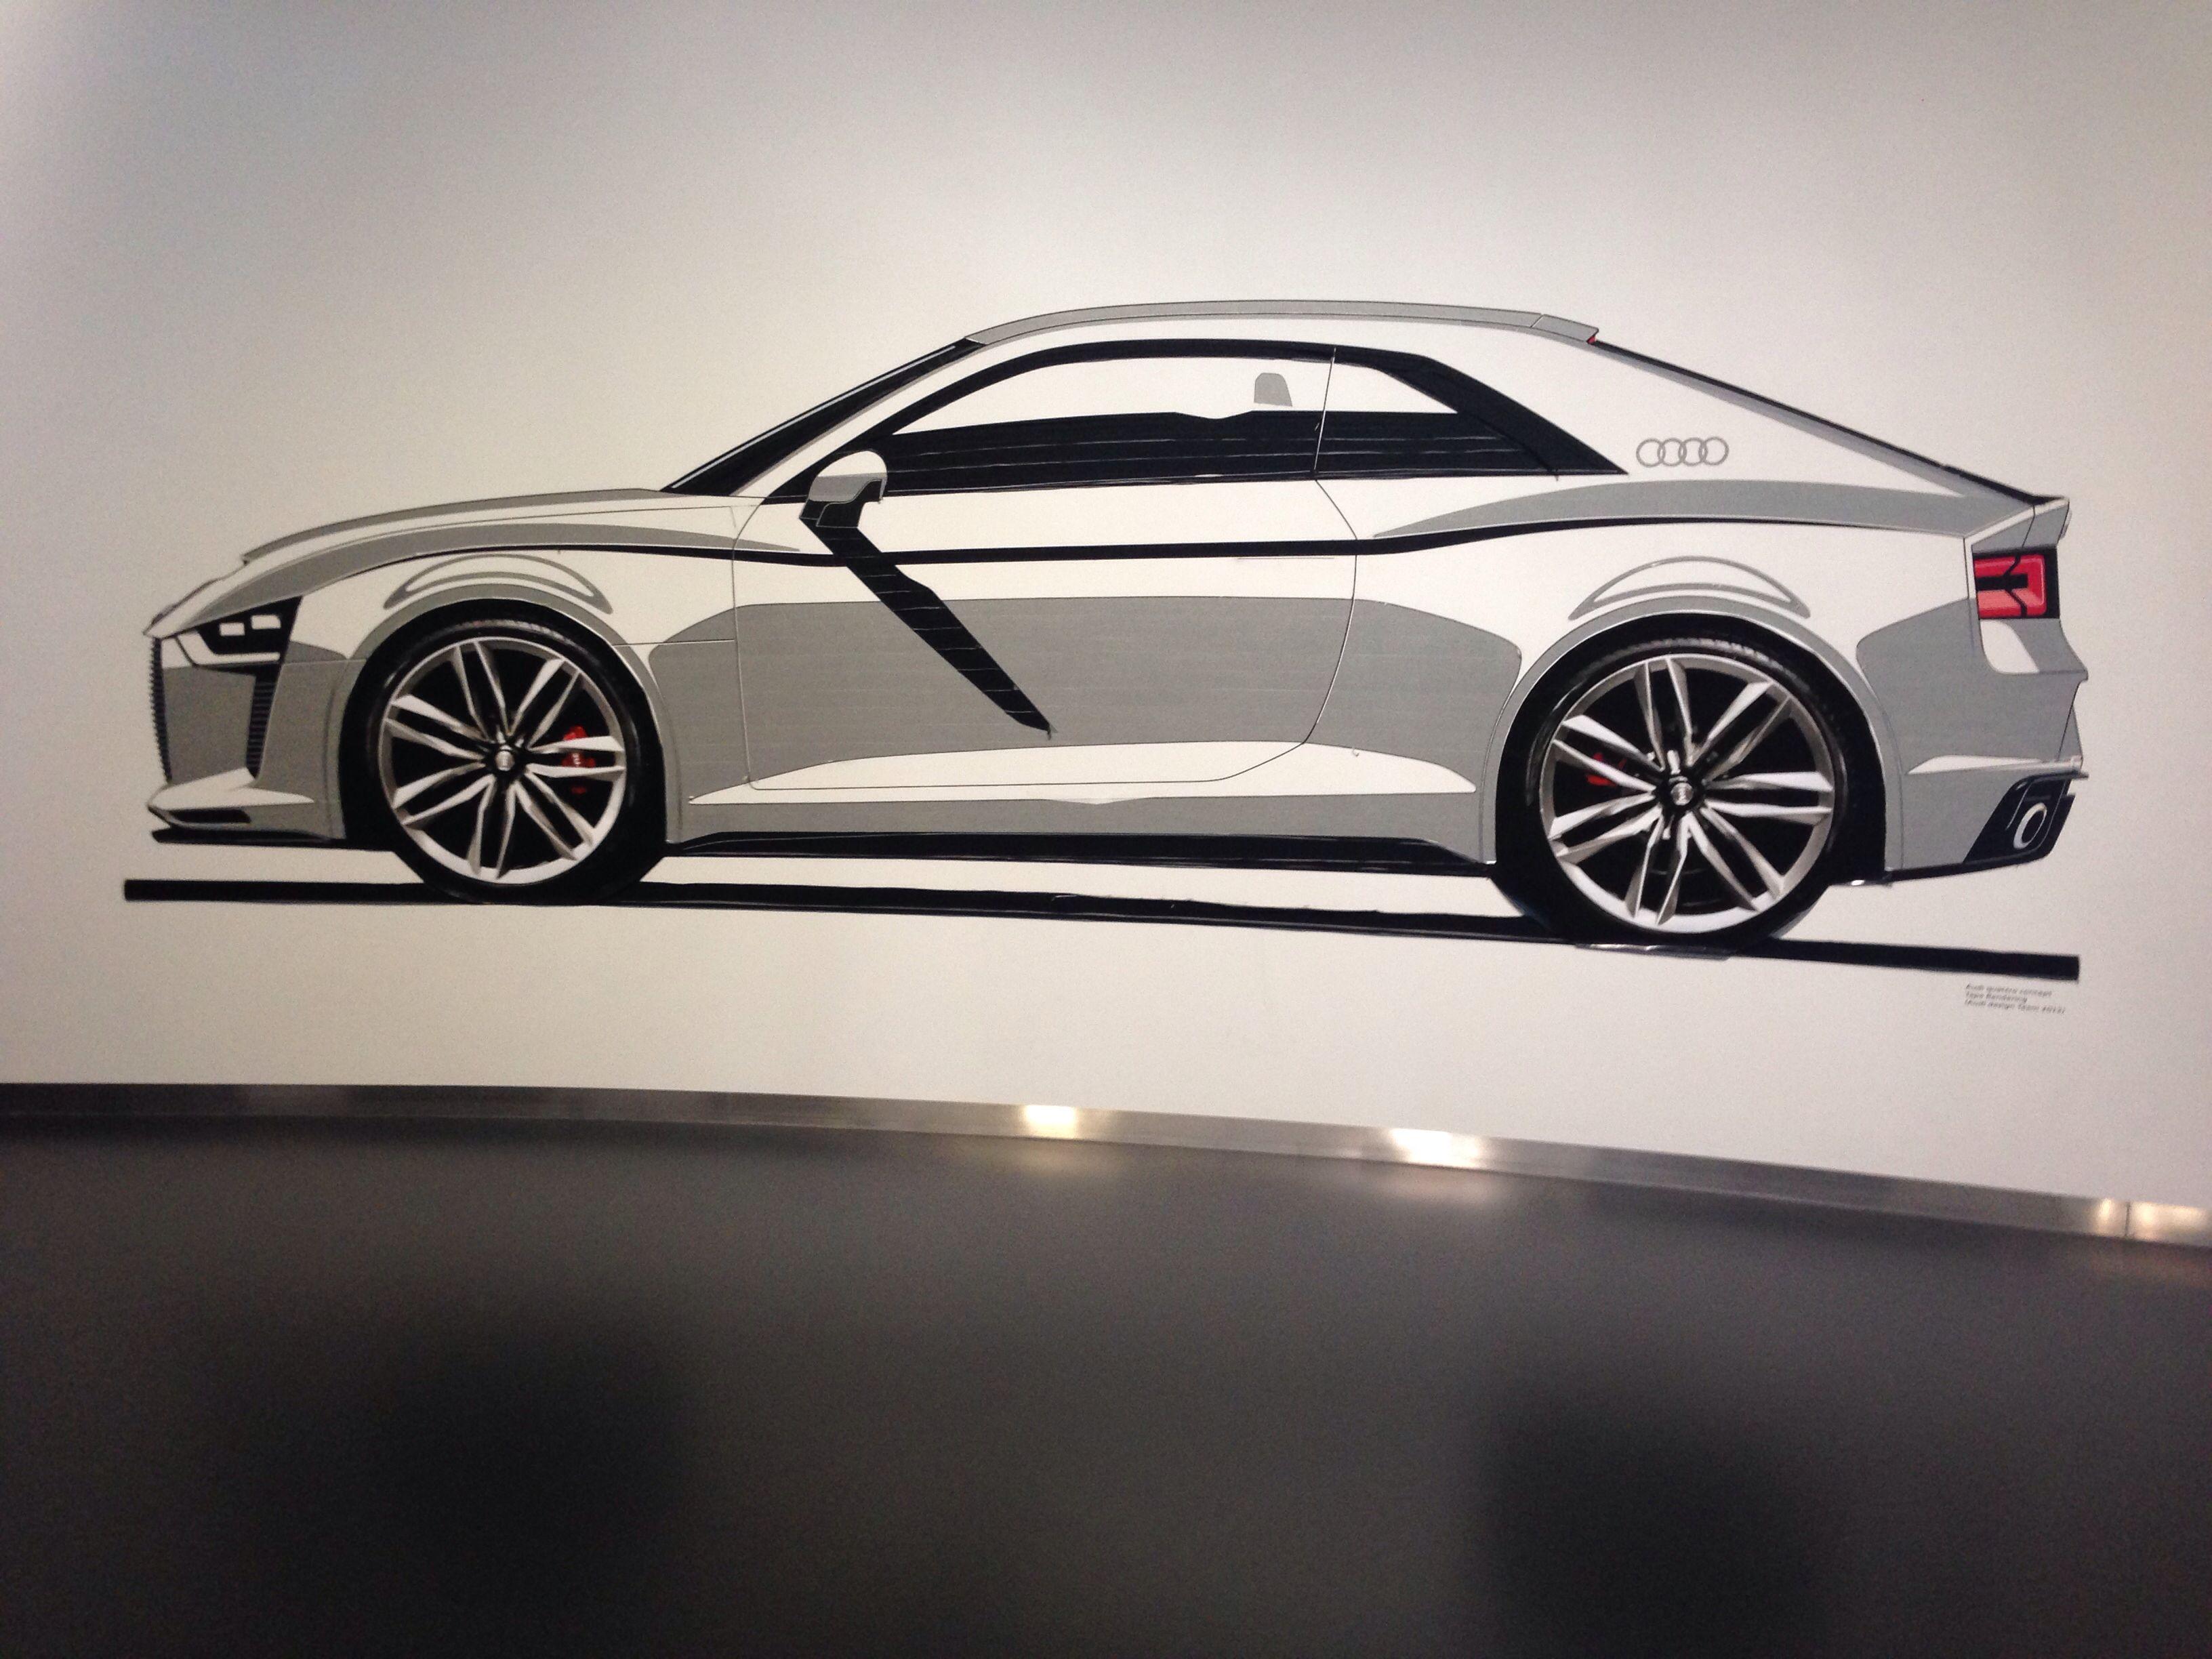 Audi tape render, amazing! Autostadt Audi pavilion - Wolfsburg